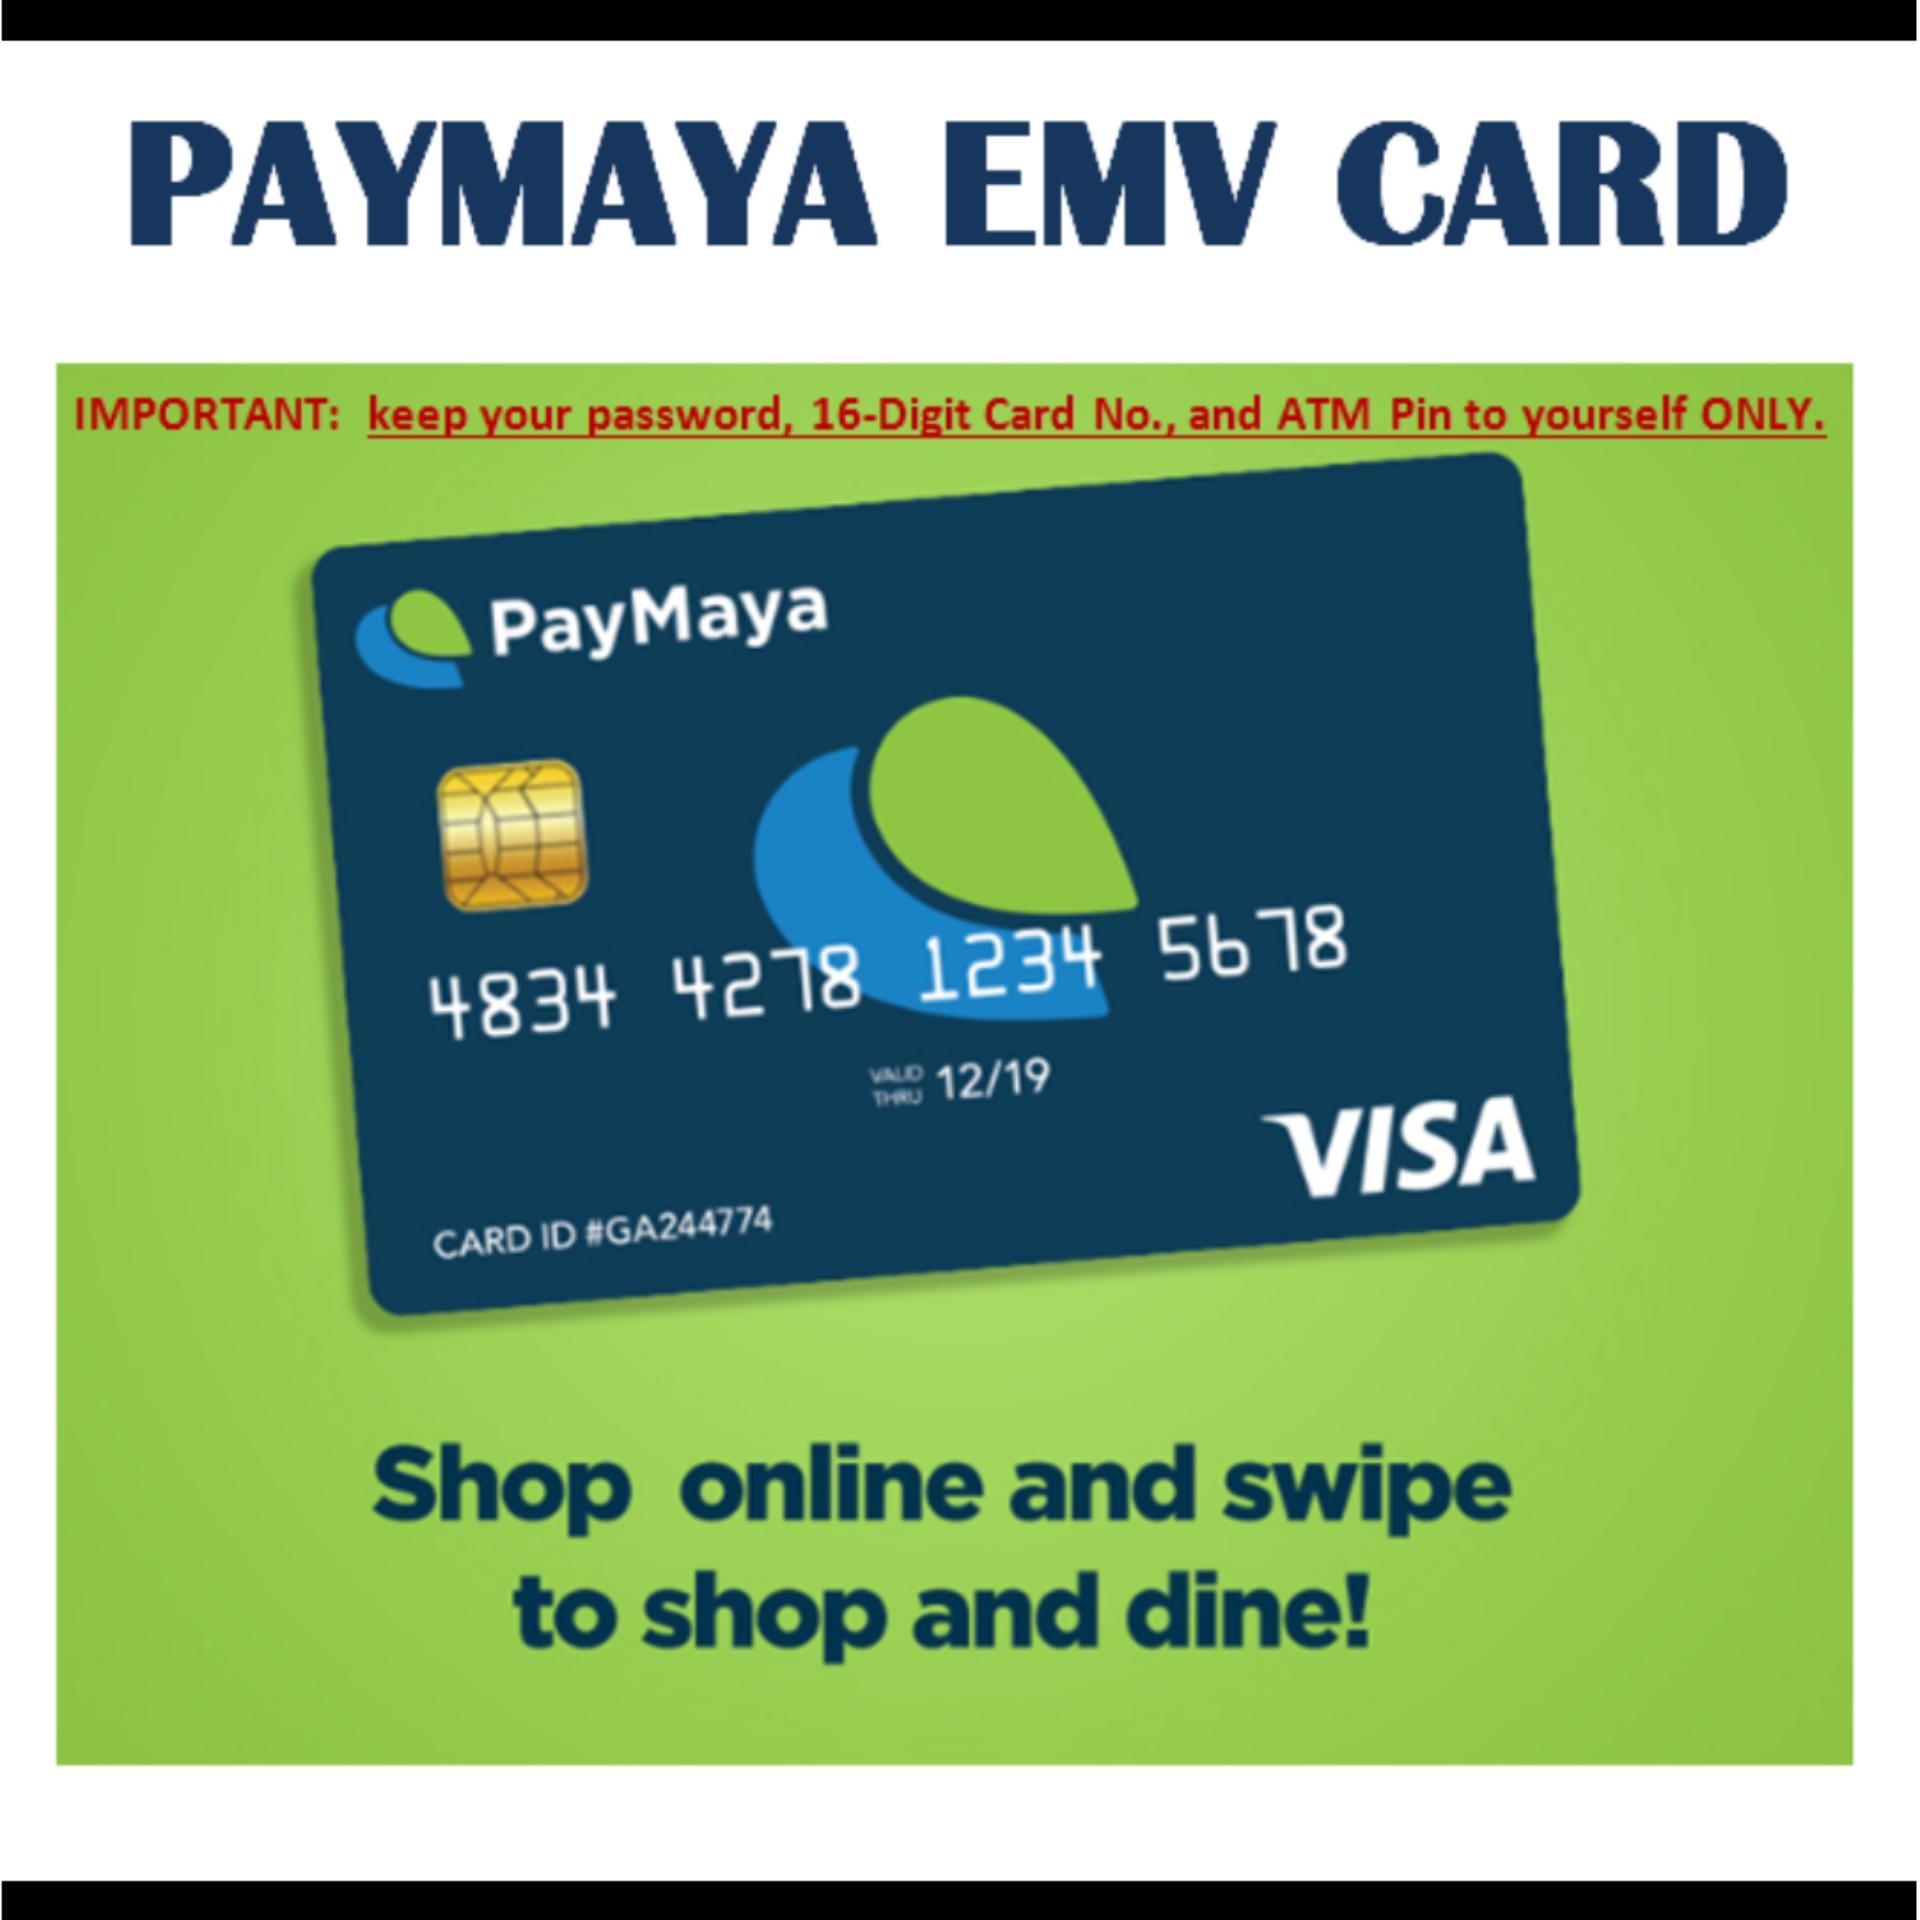 paymaya emv atm card - Load Prepaid Card Online